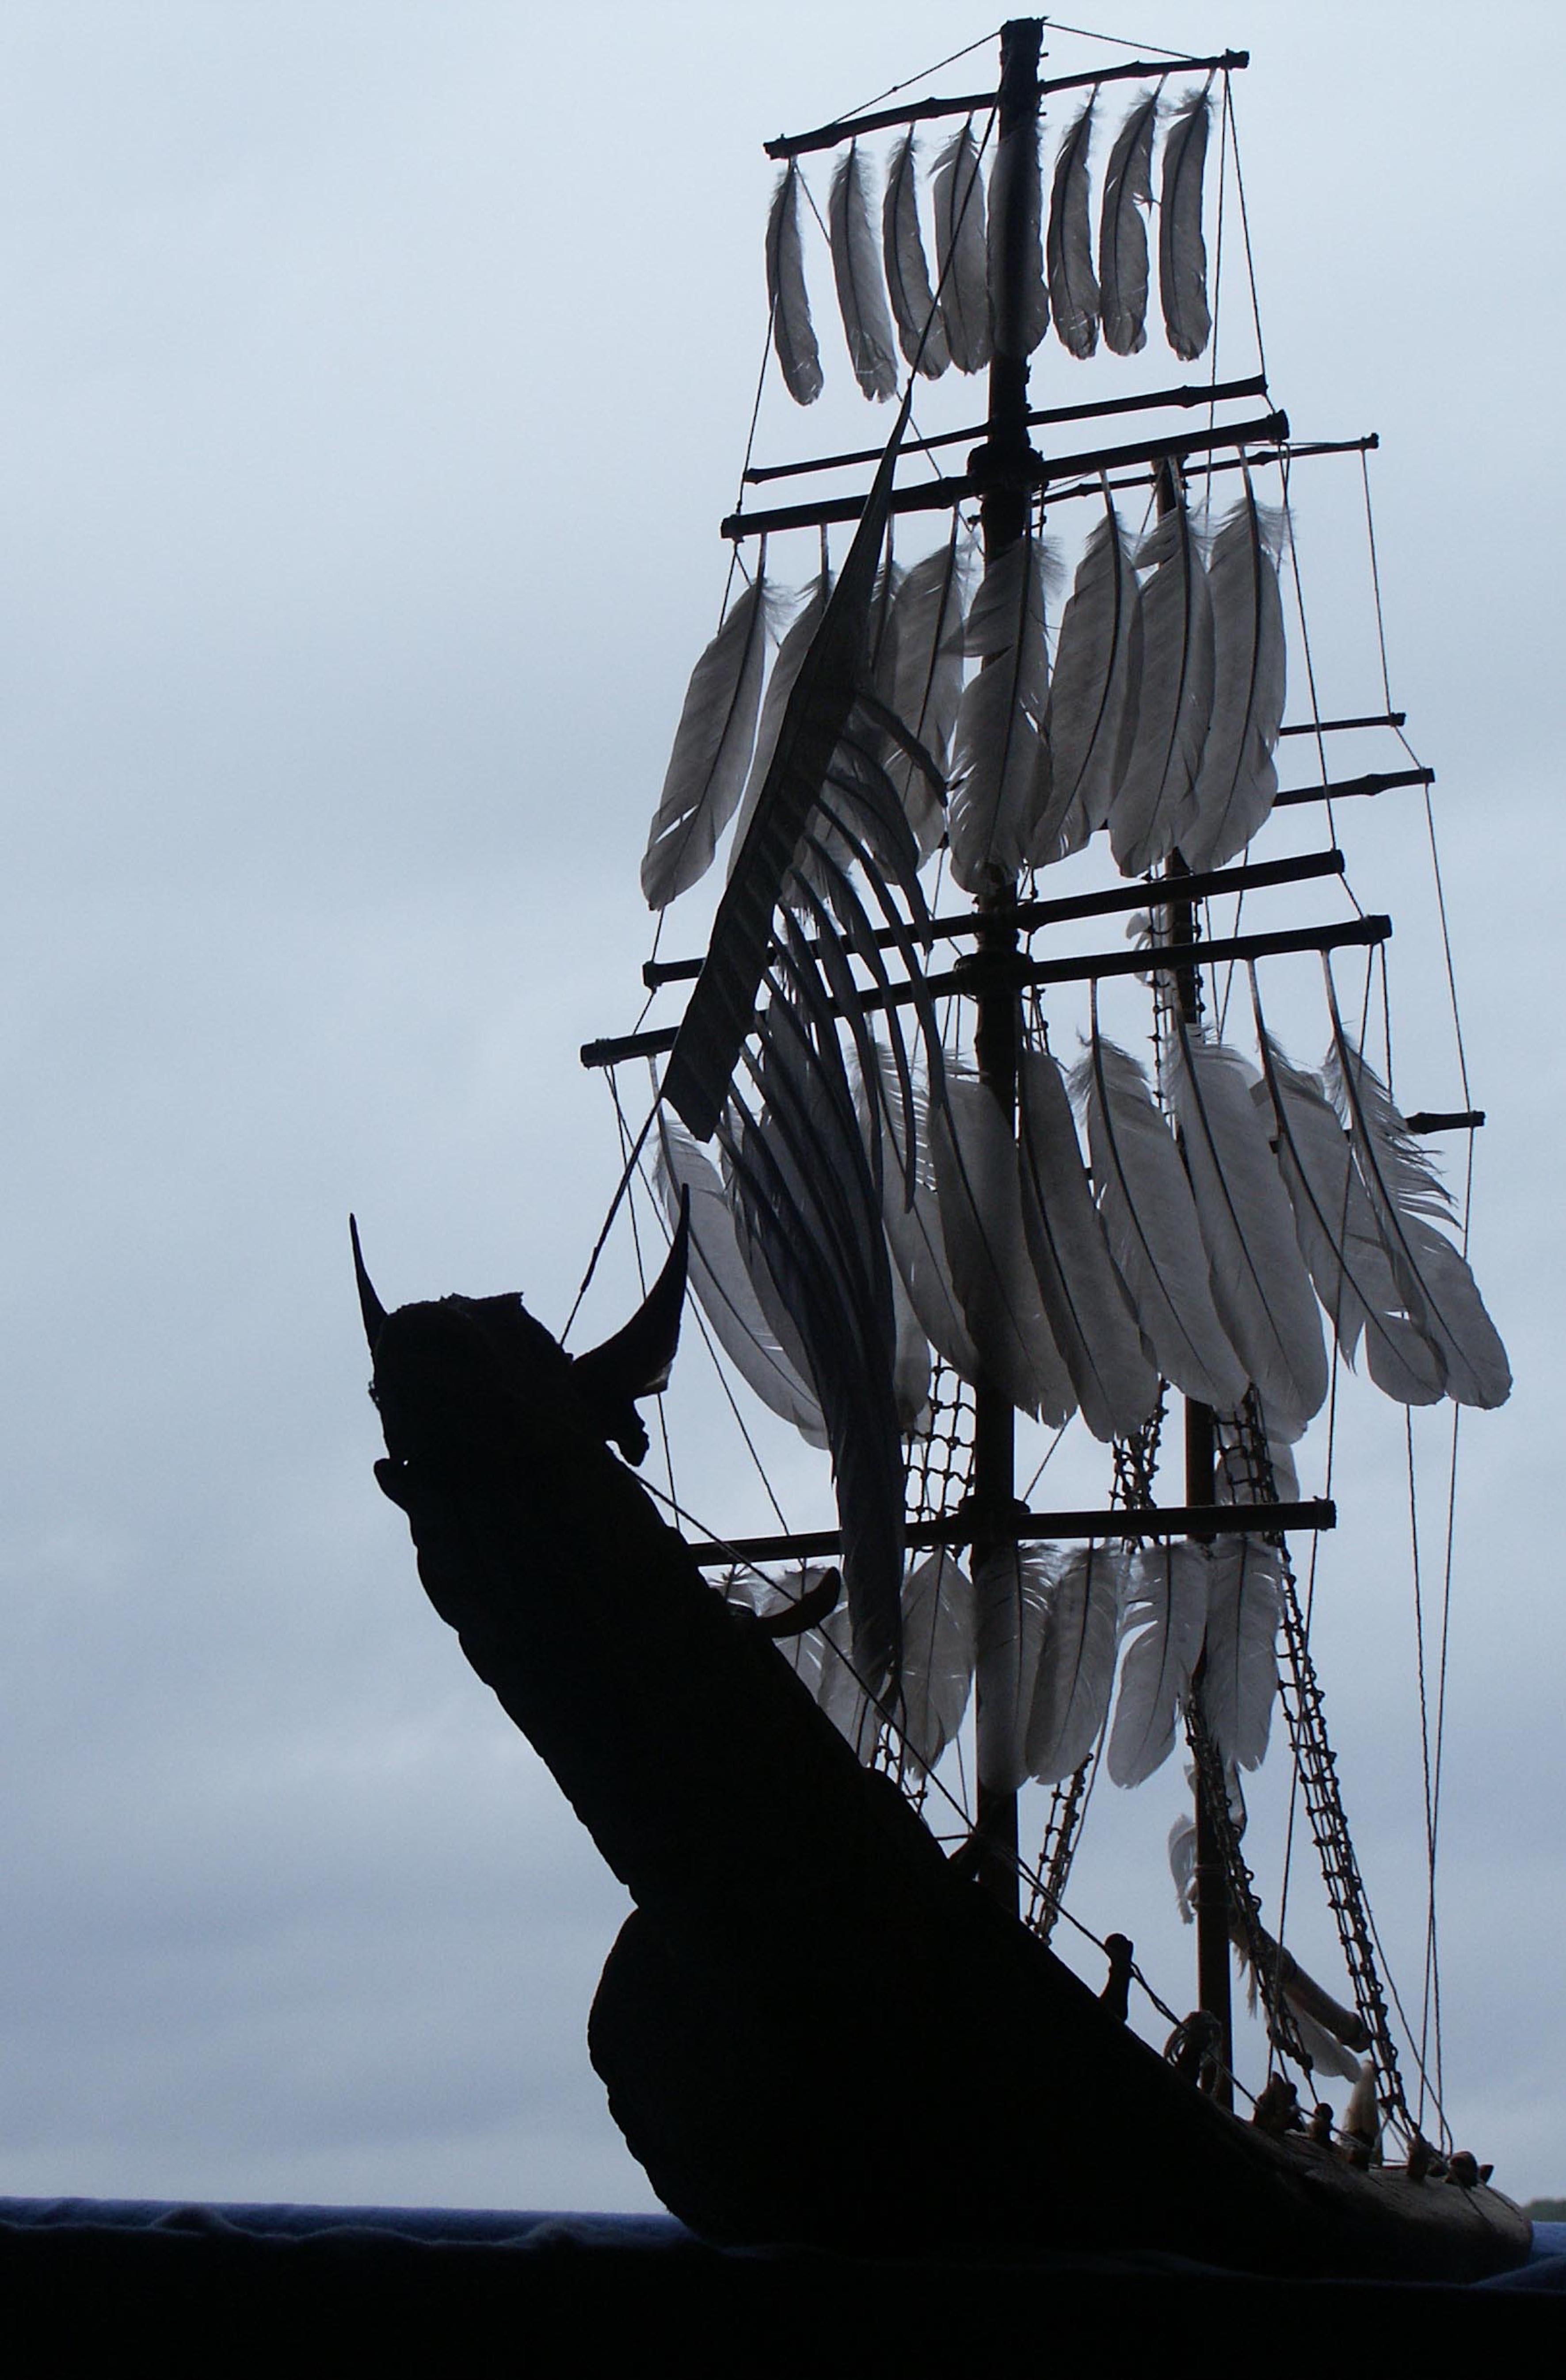 La barque fantôme © Franck Marion16.